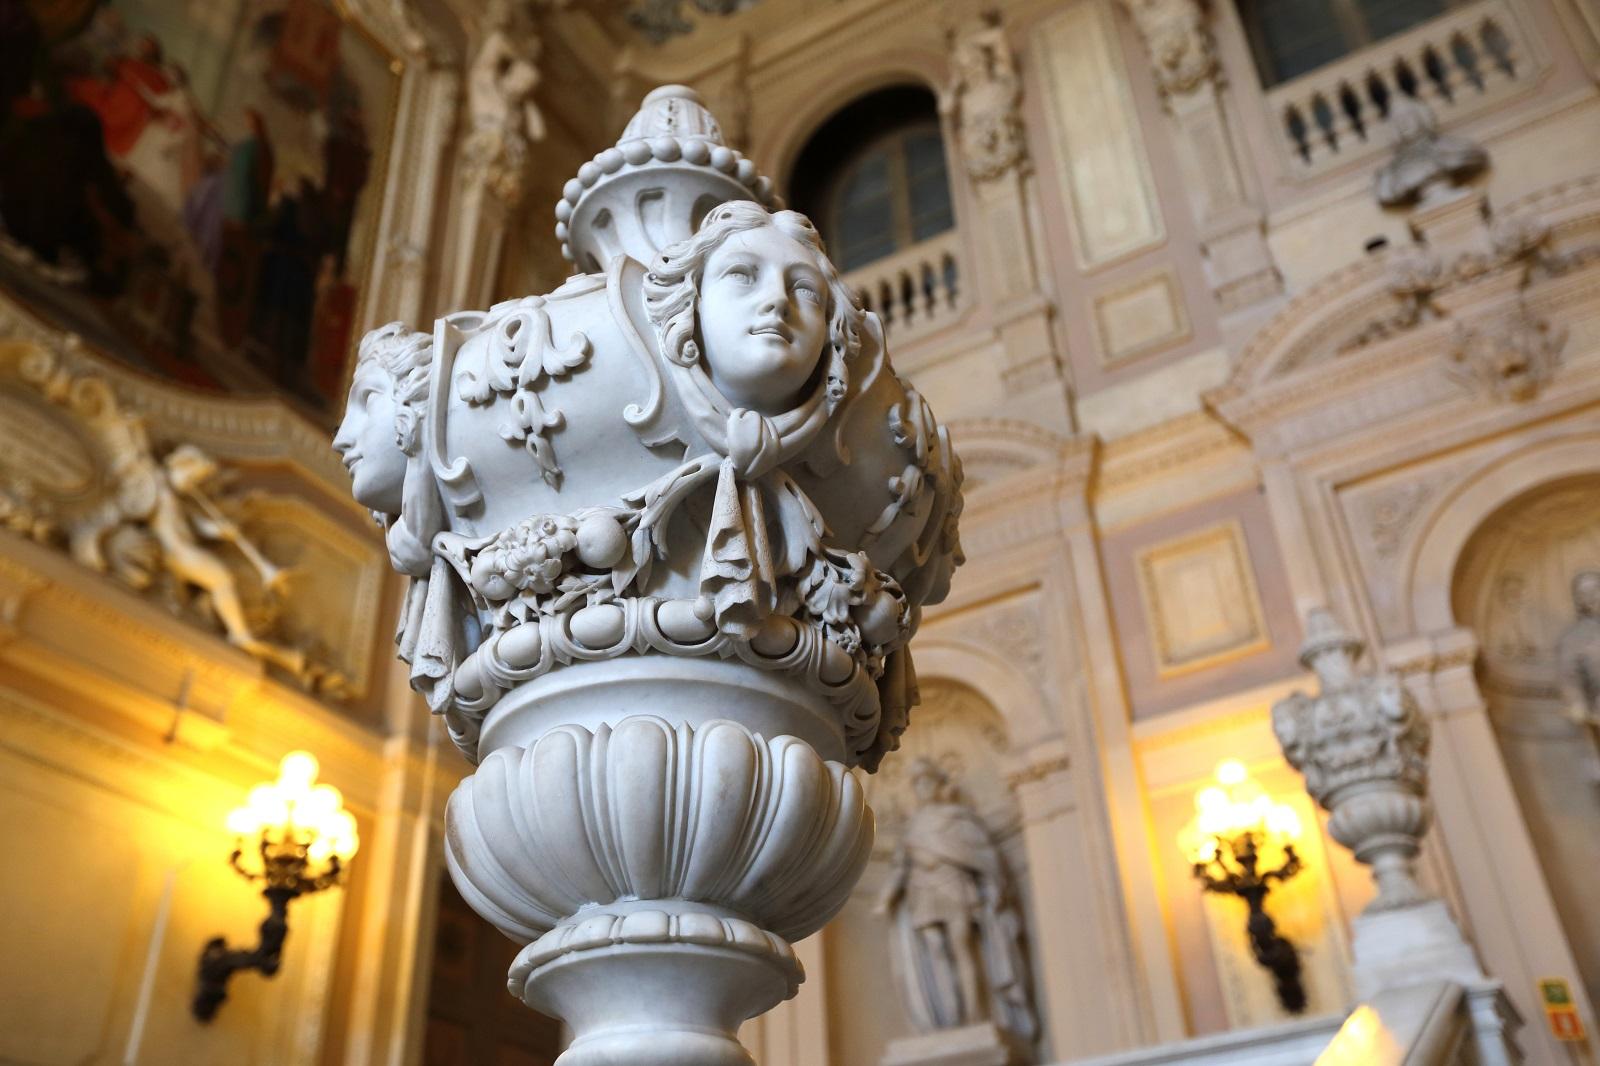 palazzo-reale-museum-turijn-8